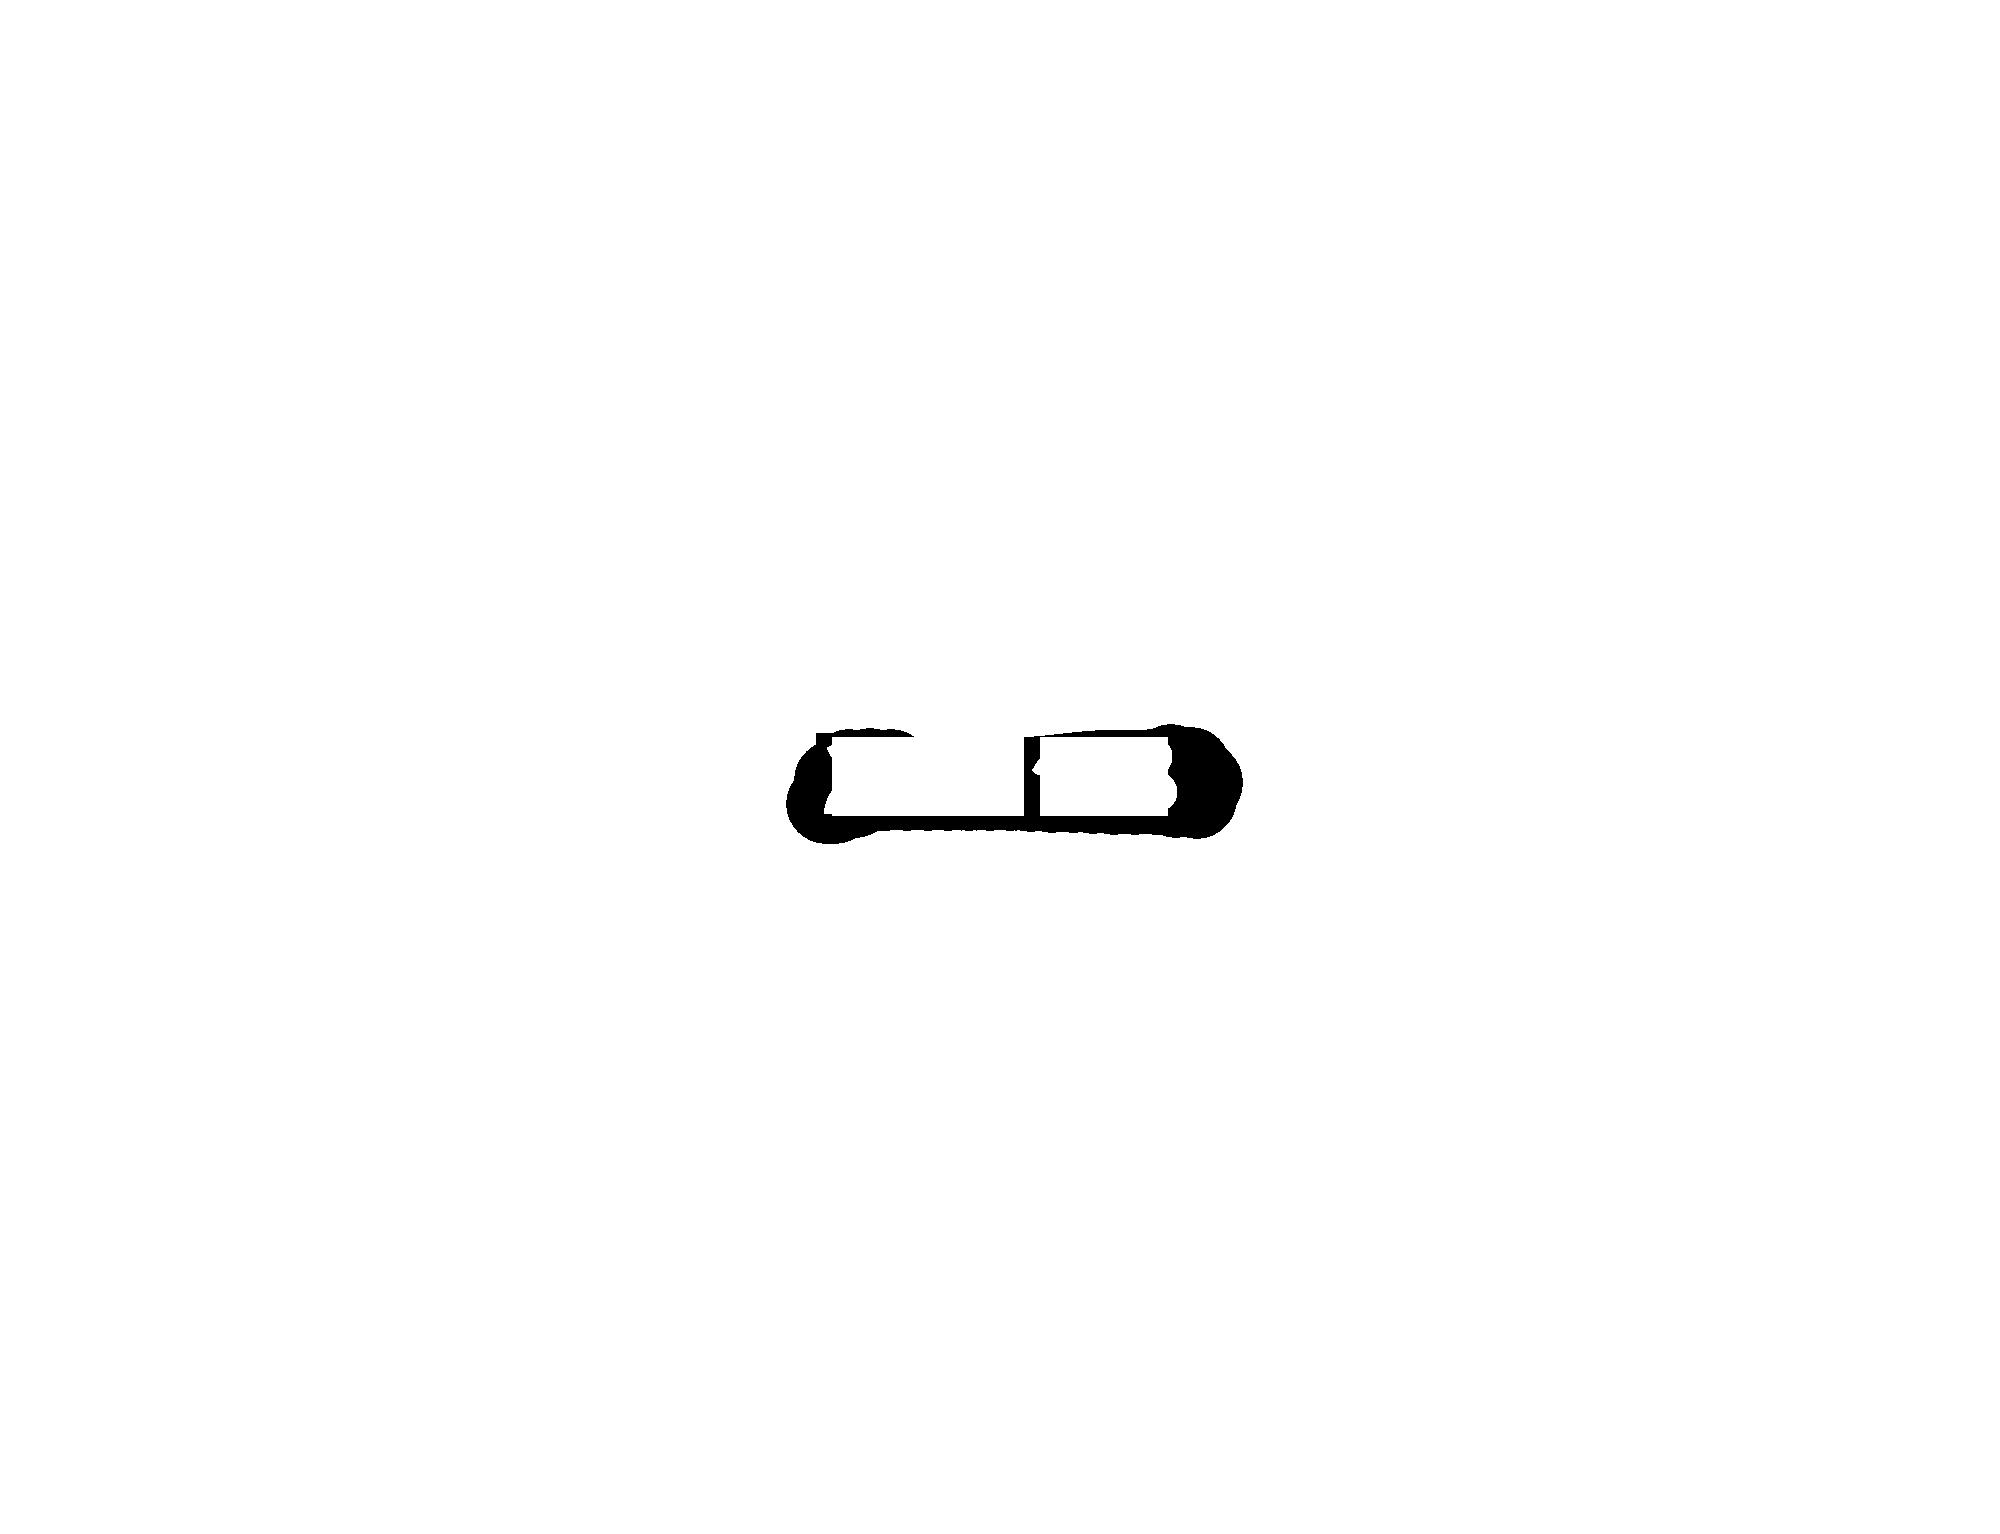 2018-FilmQuestSelection-BlackSmall copy.png